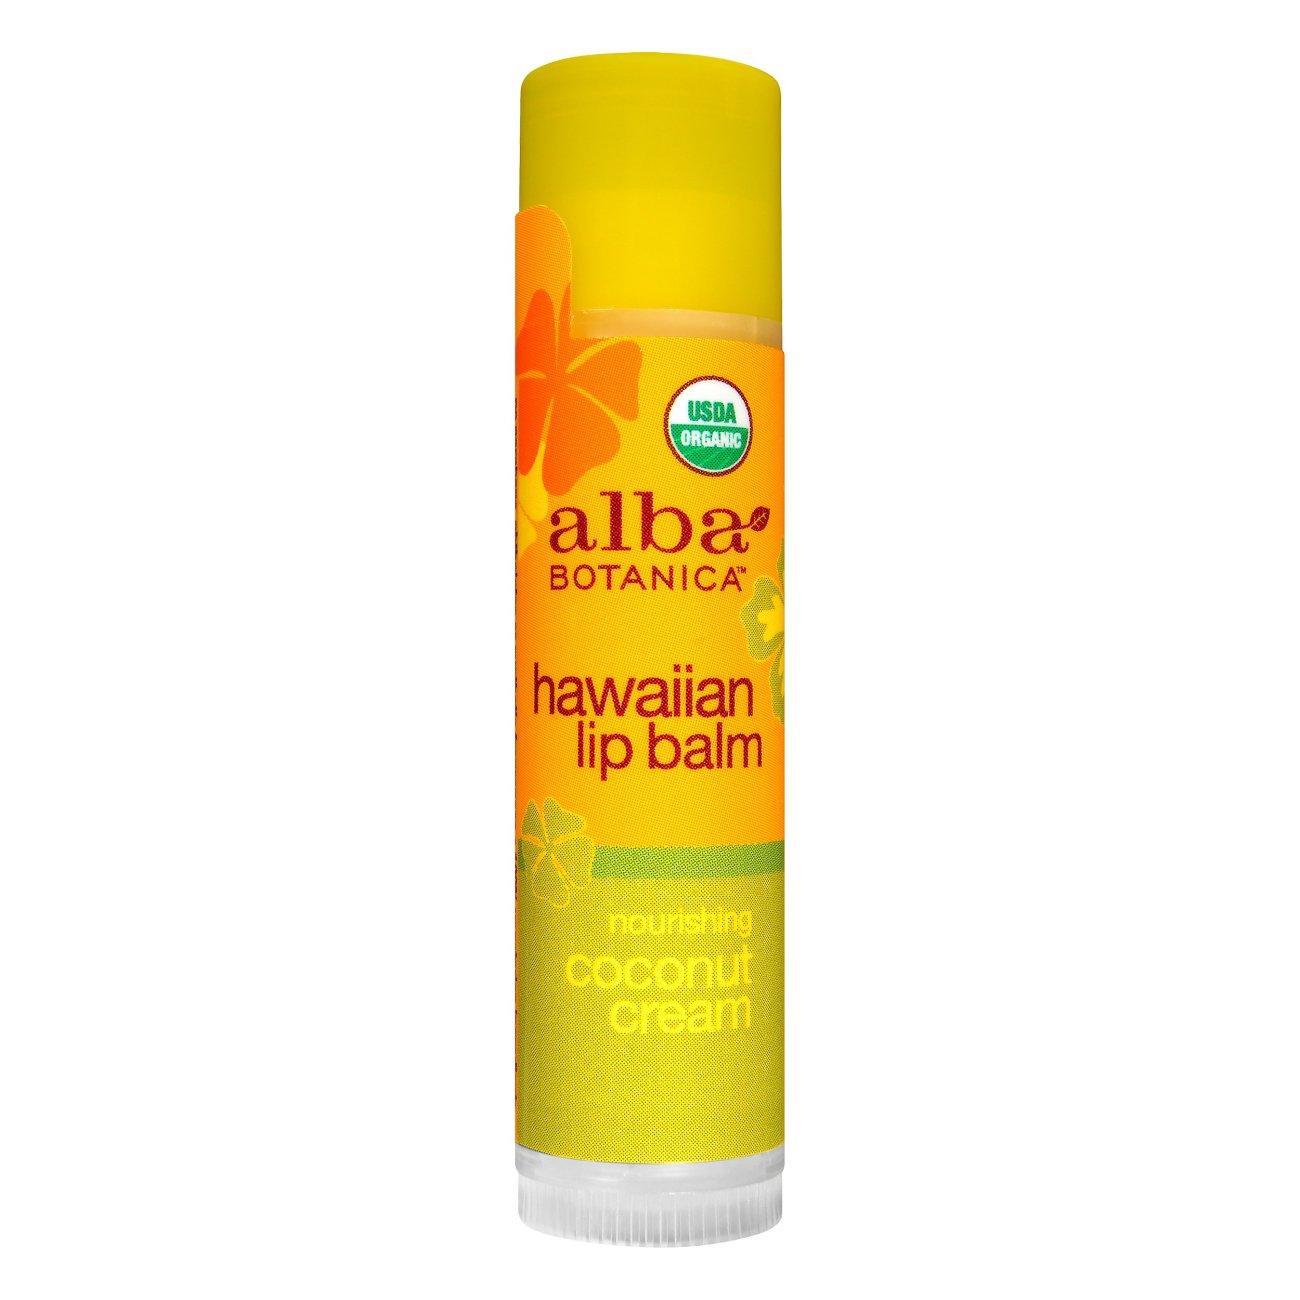 Image result for Alba Botanica Coconut Creme Lip Balm